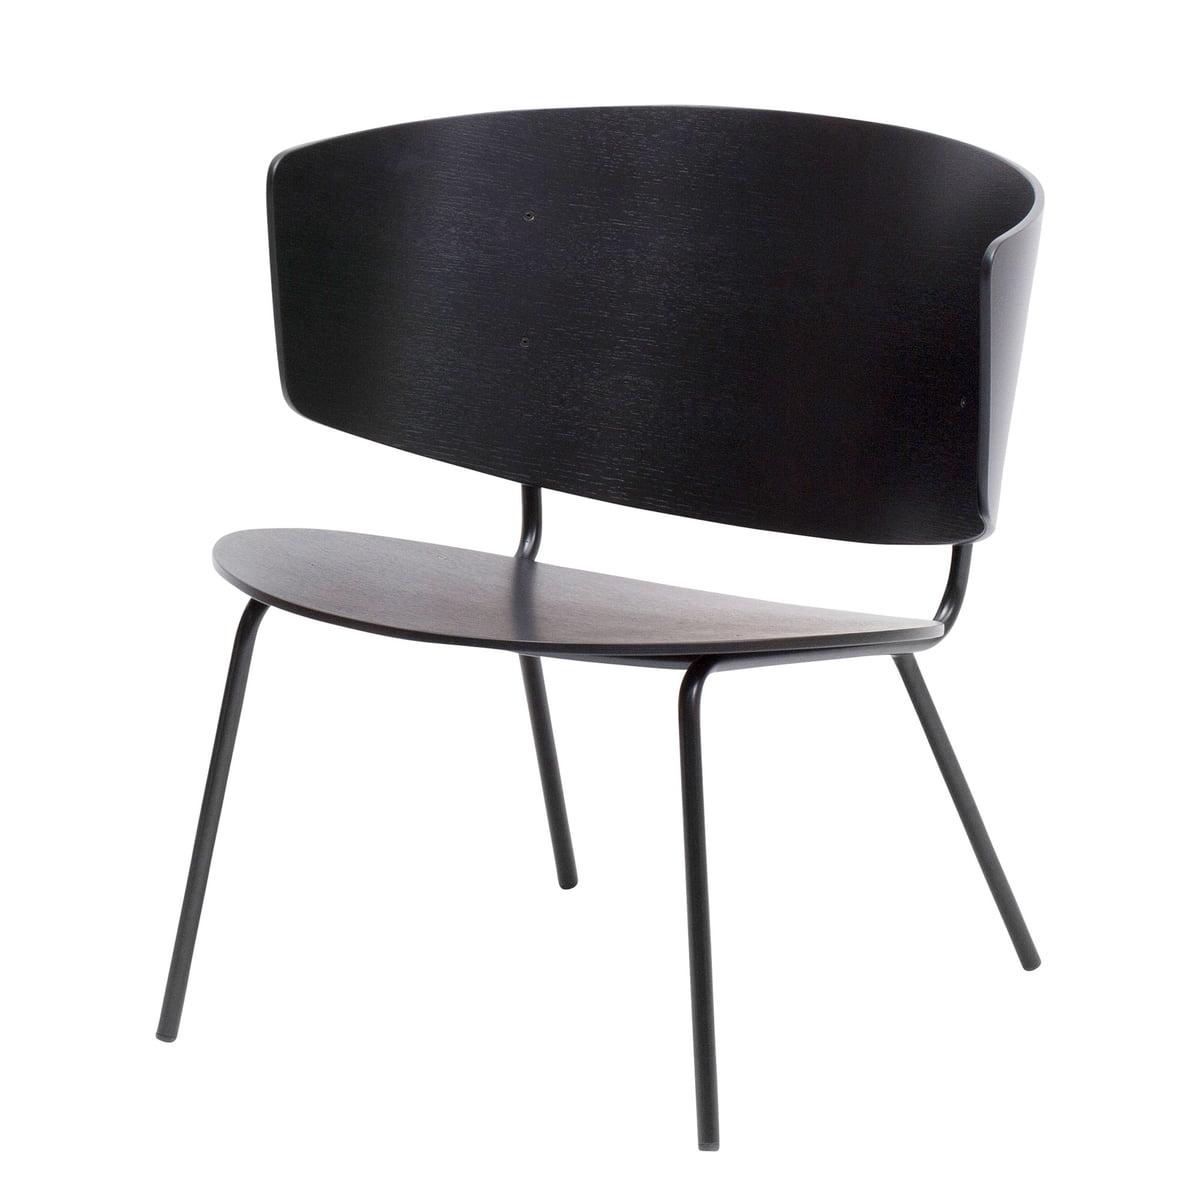 Herman Lounge Chair By Ferm Living - Herman chair